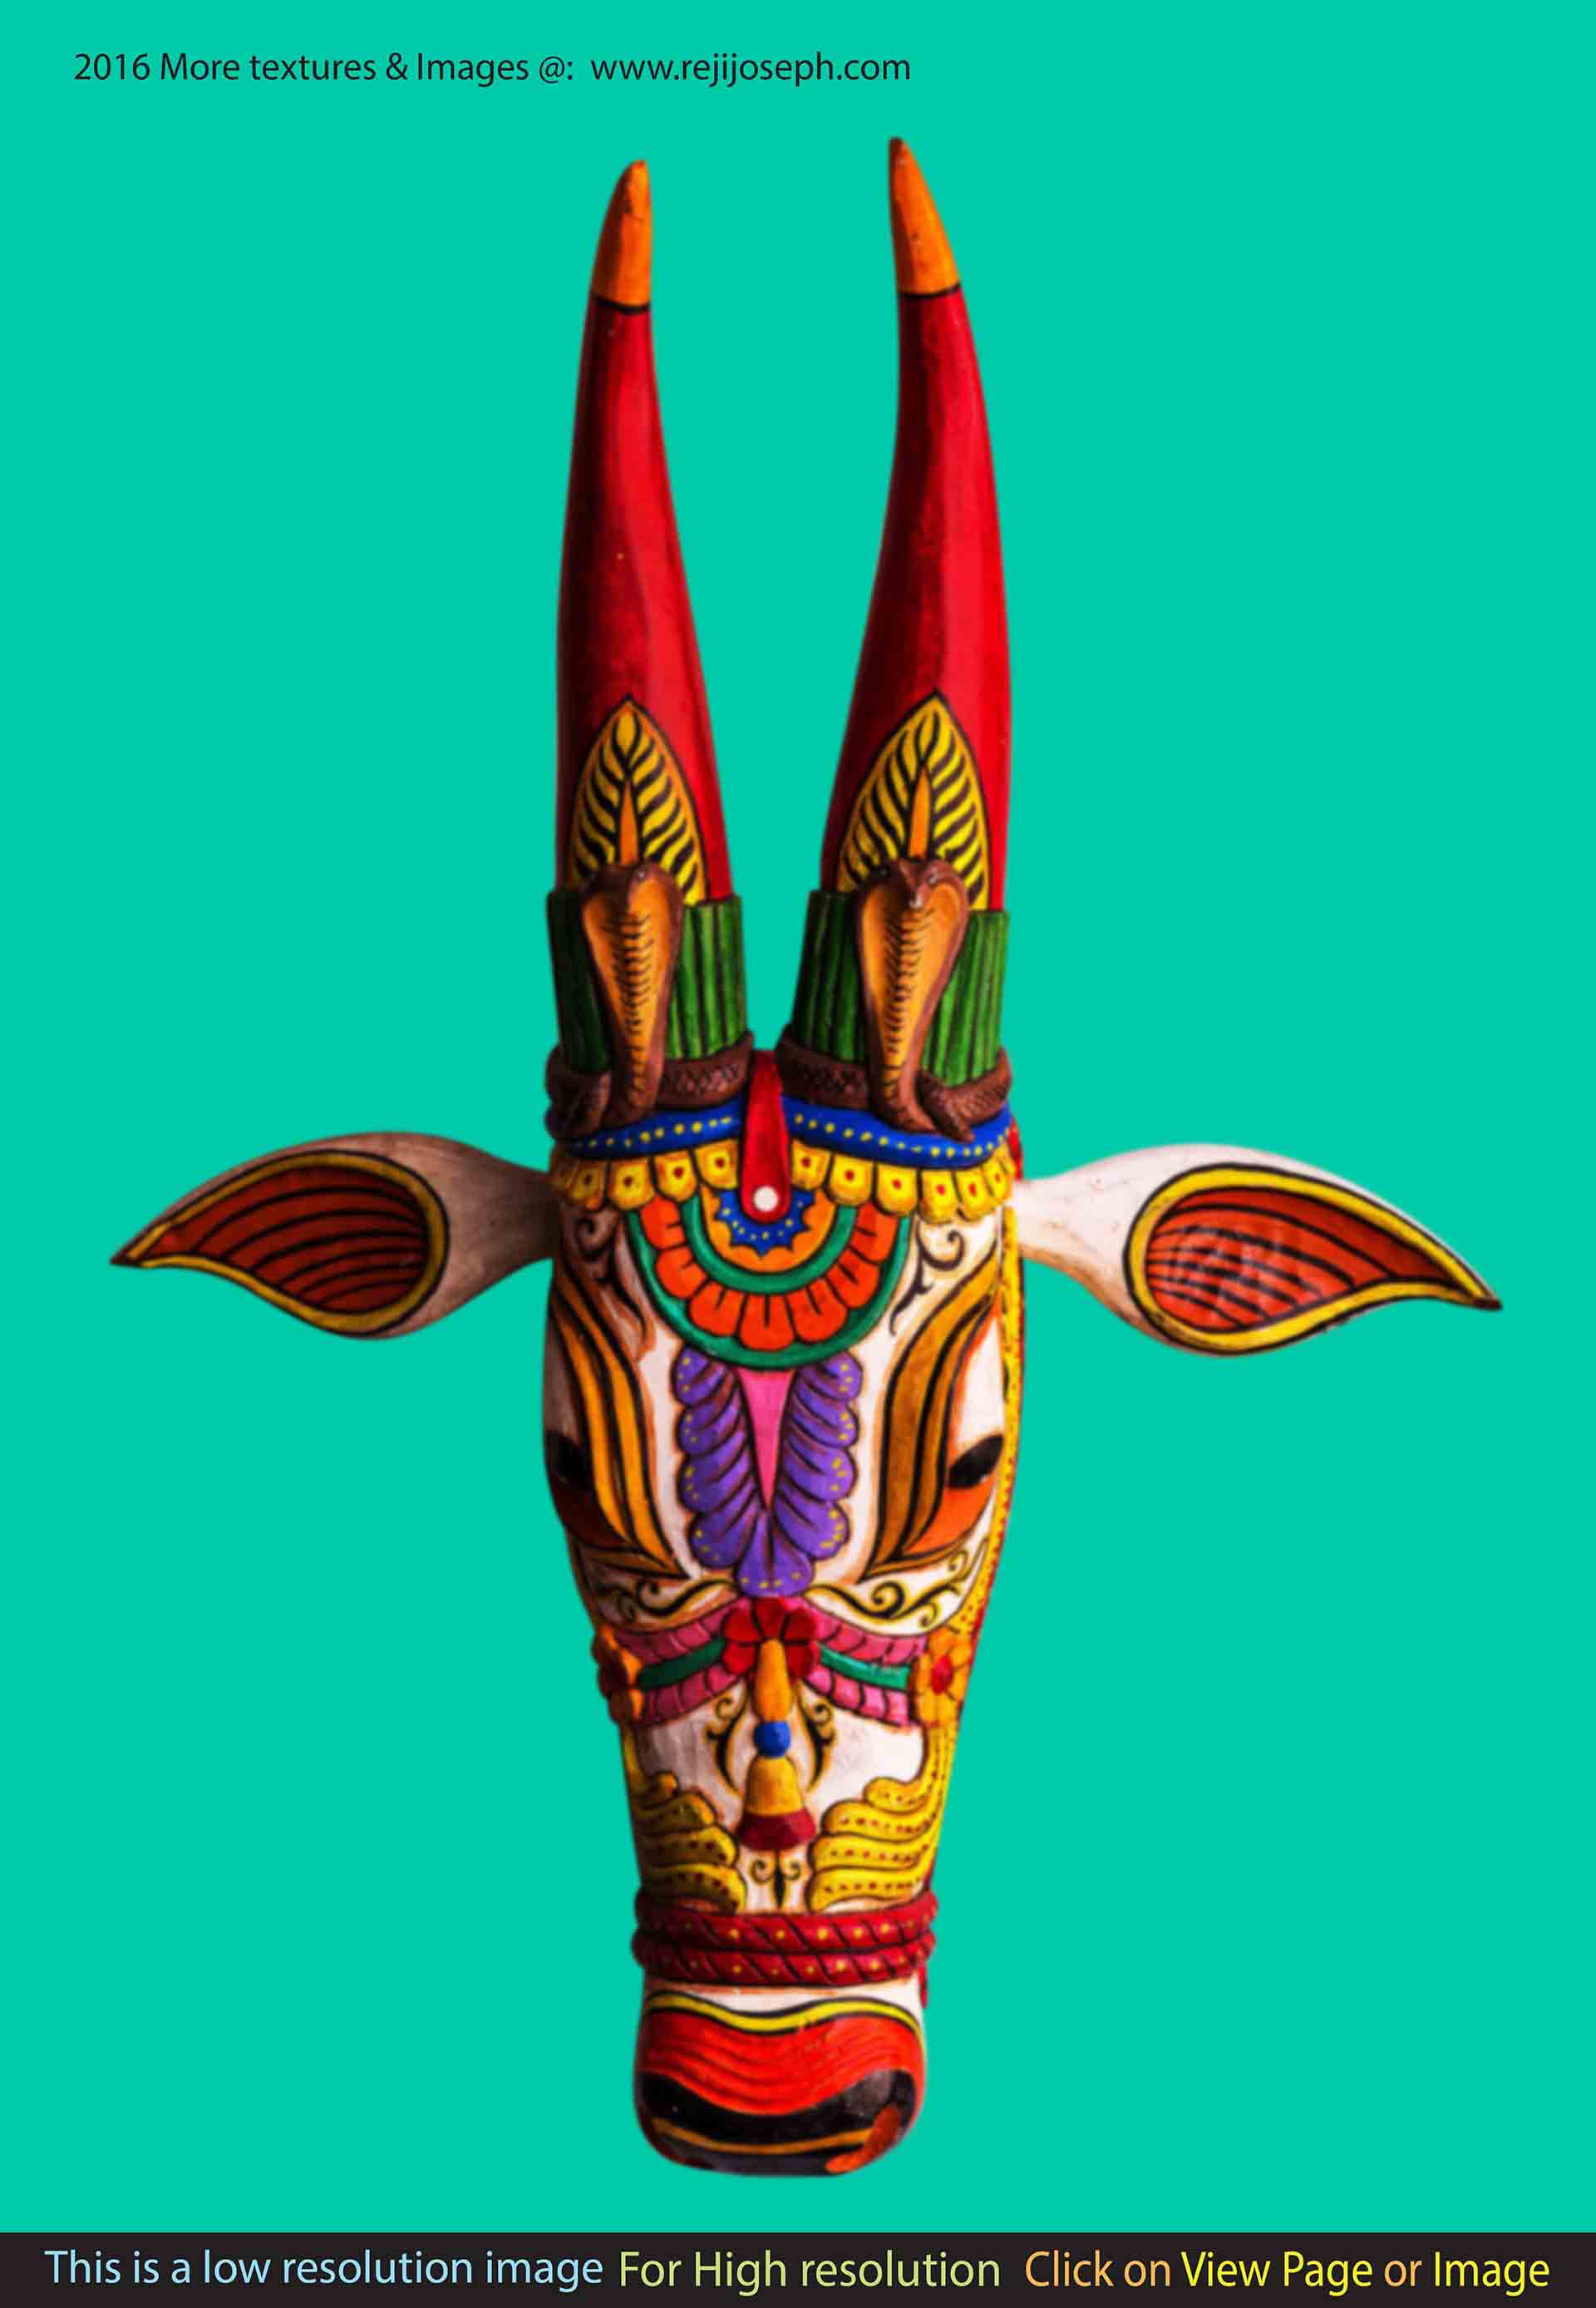 Coloured wooden bullock head 006